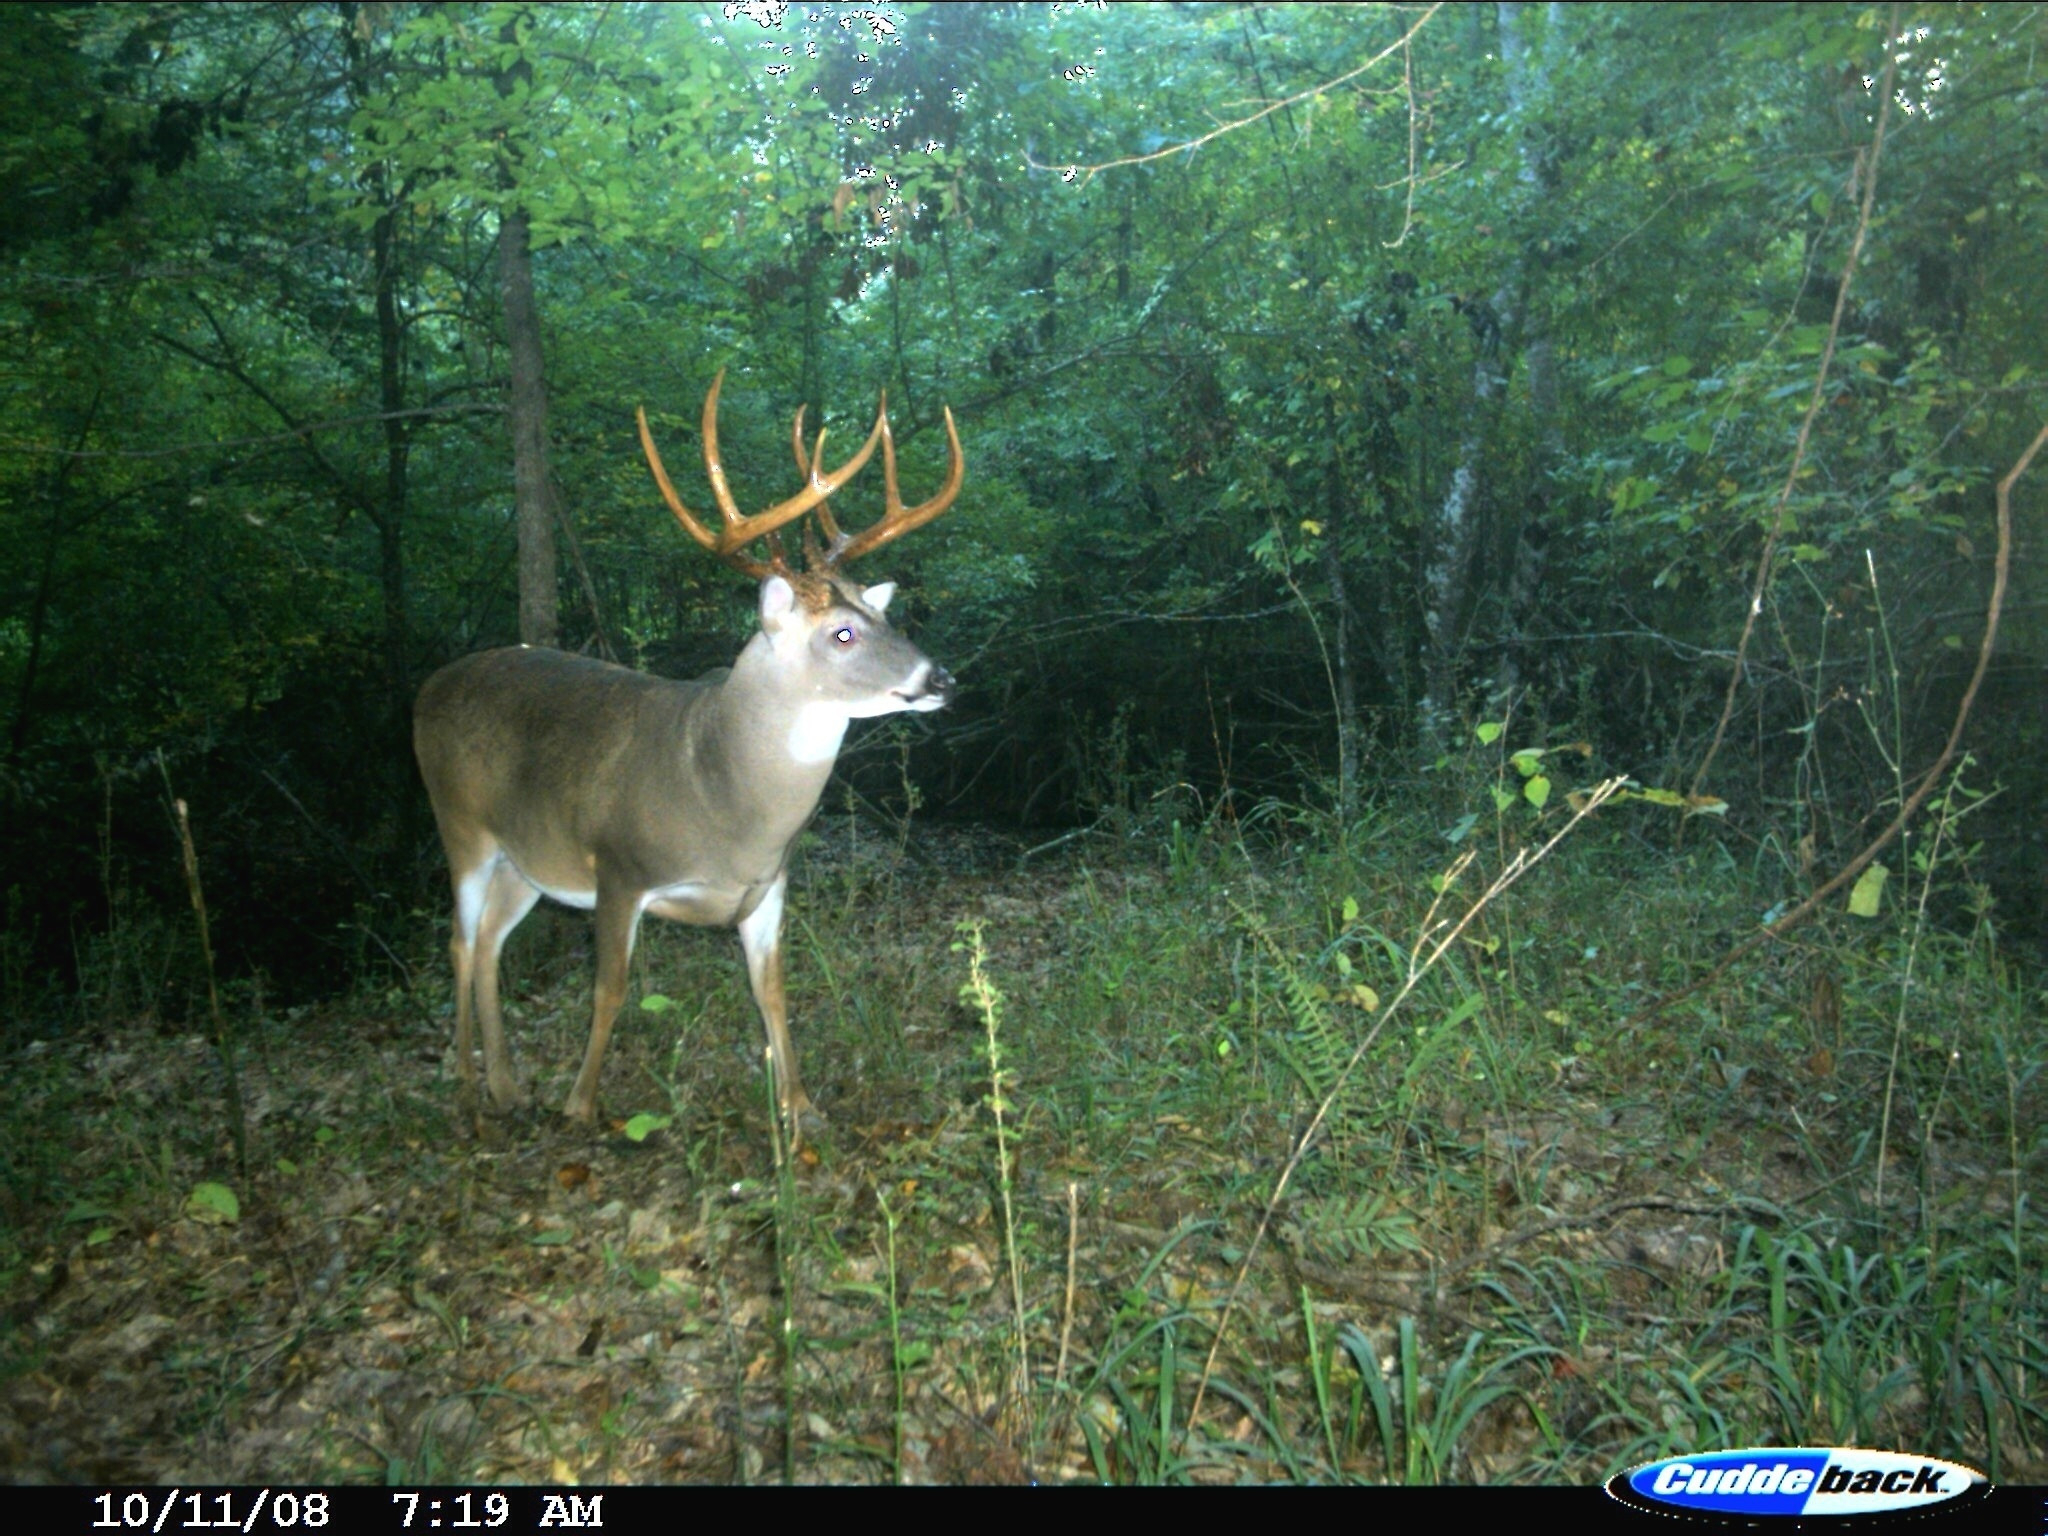 2021 Wny Whitetail Deer Rut | Calendar Template Printable  2021 Deer And Deer Hunting Rut Calendar